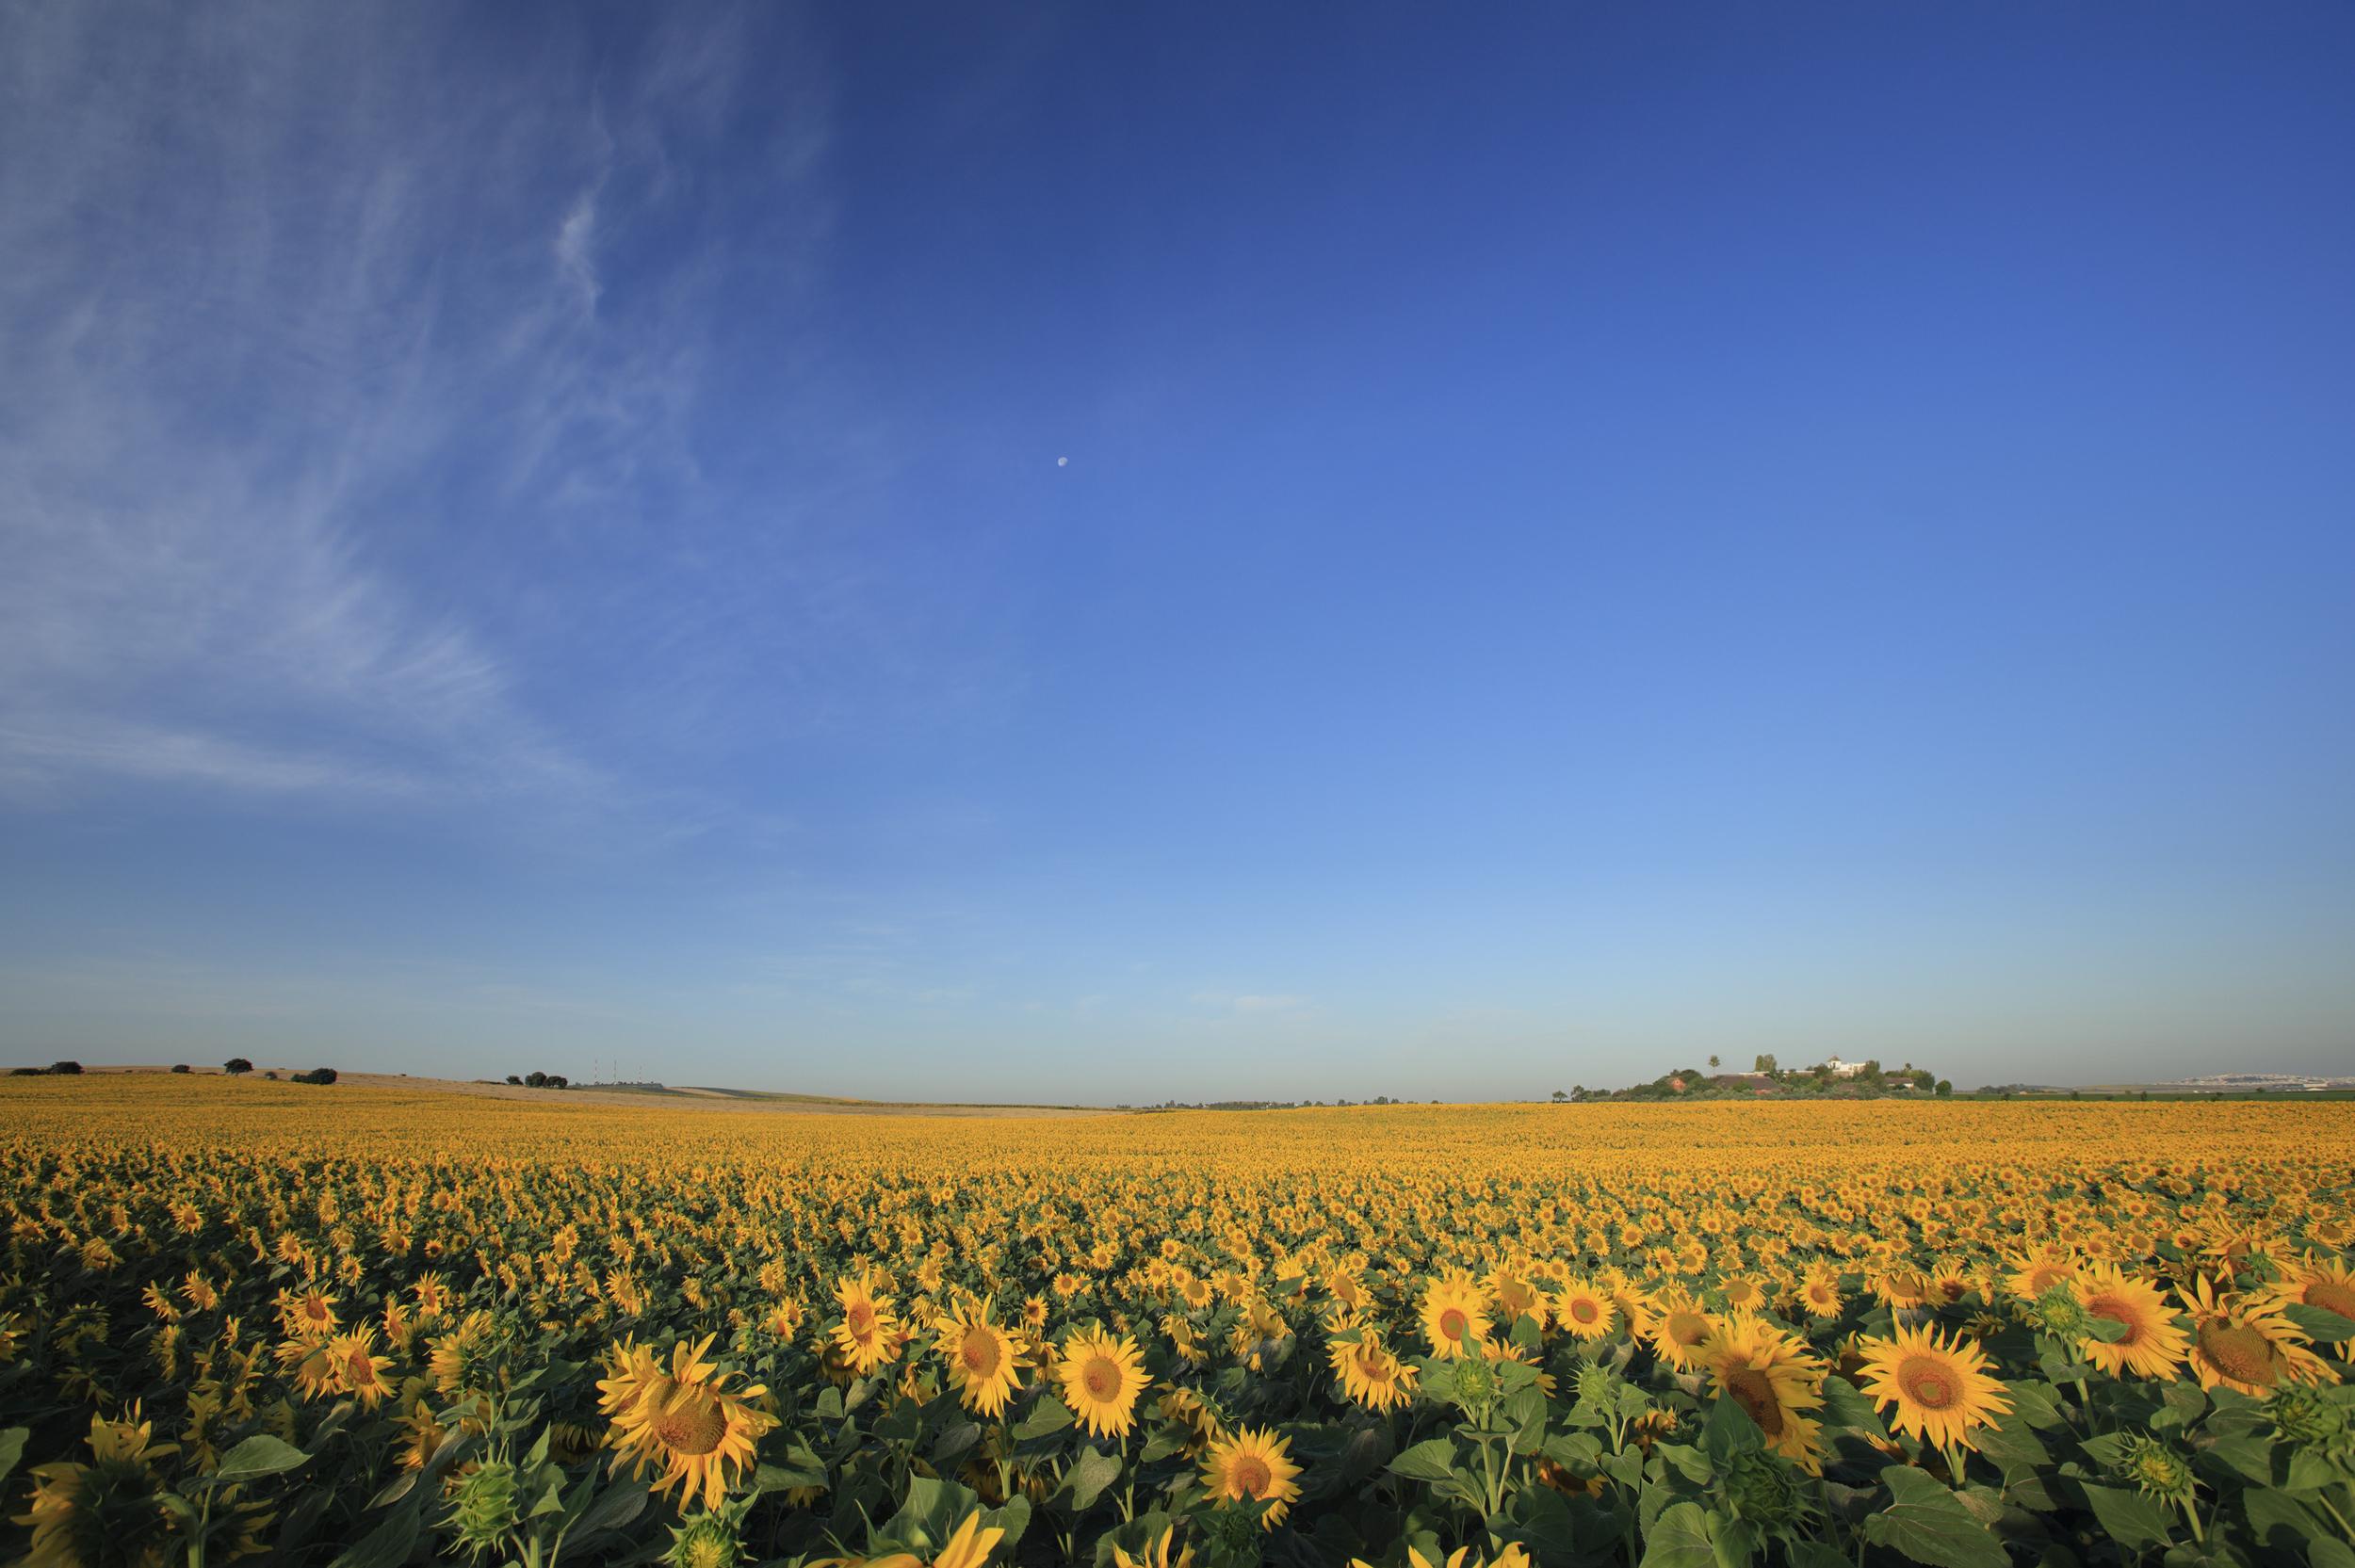 Sunflower field with HSR in distance.jpg